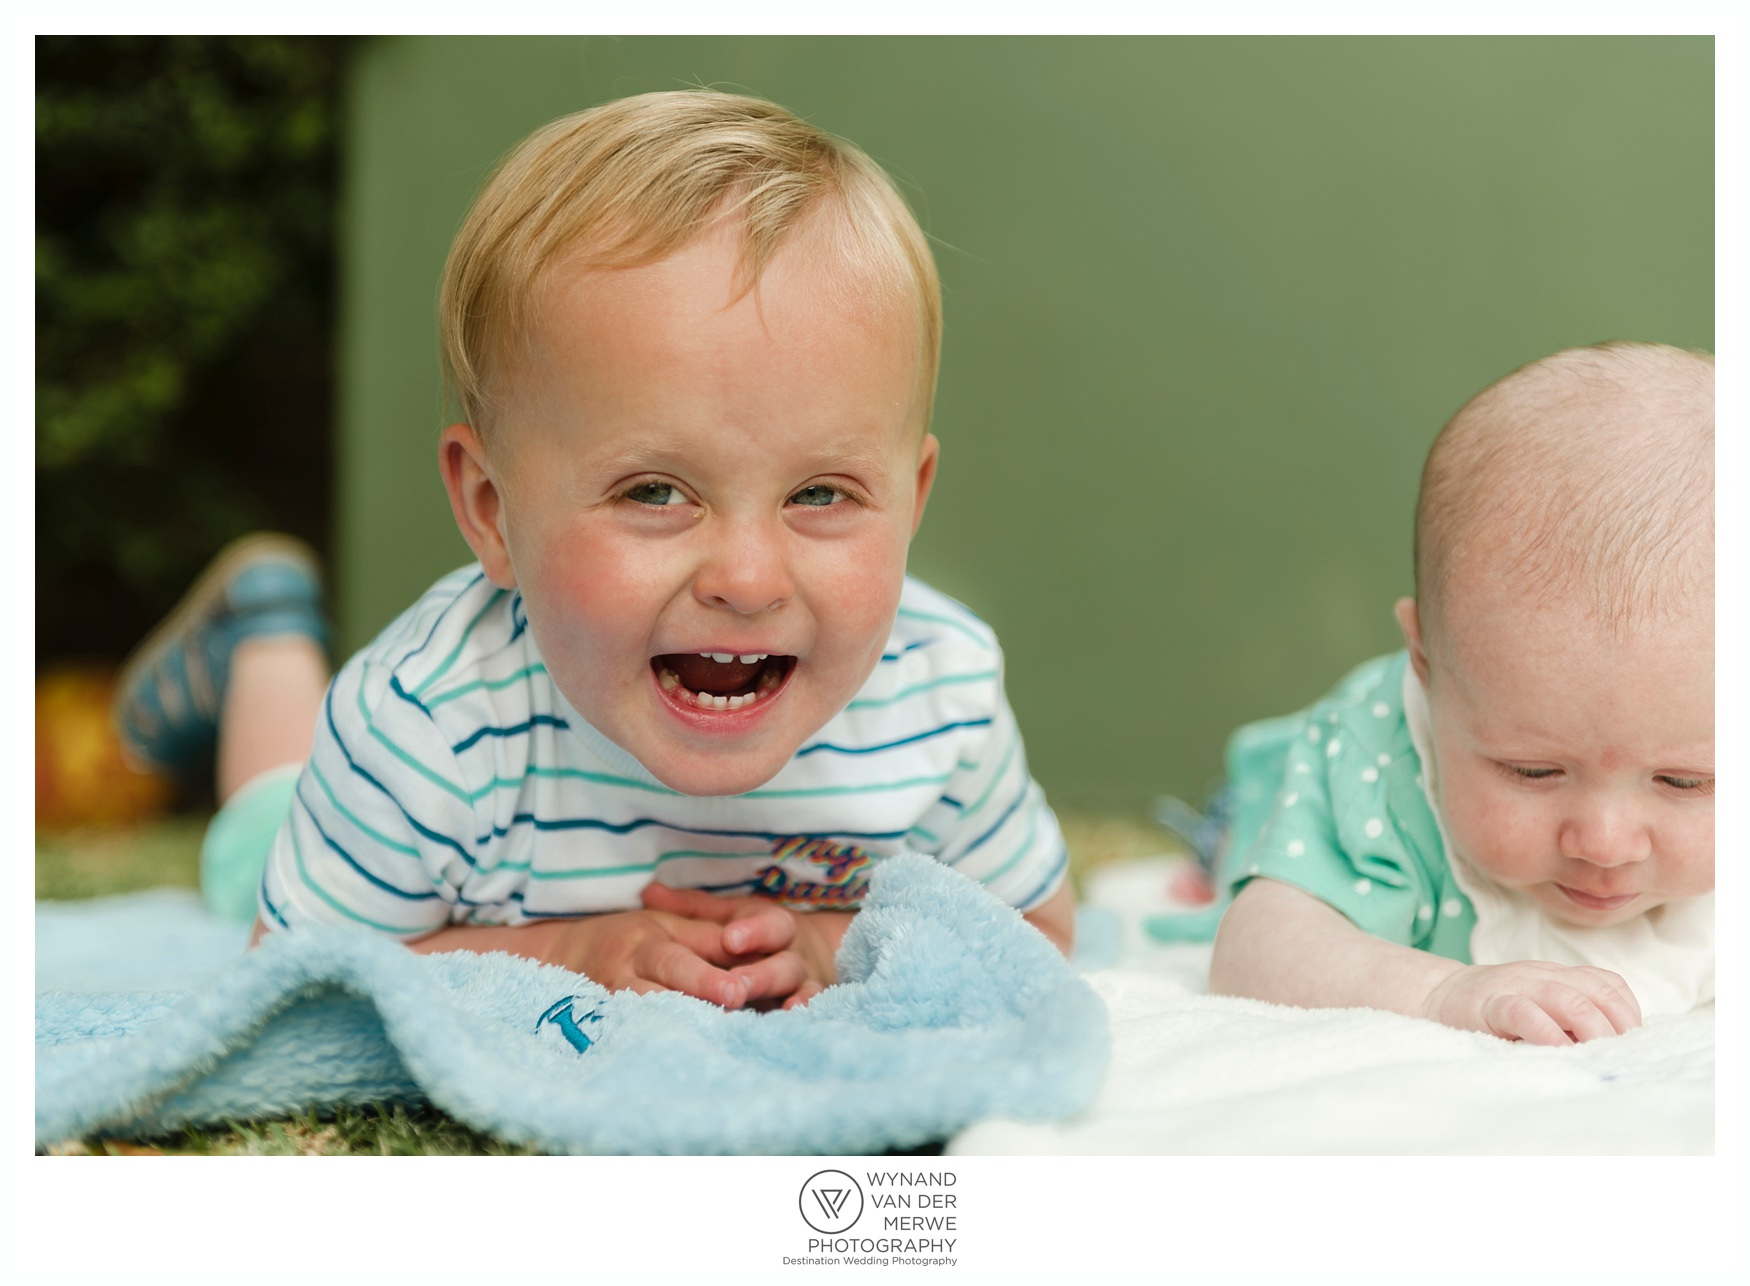 Wynandvandermerwe kirsten robert family lifestyle photography benoni location gauteng-58.jpg